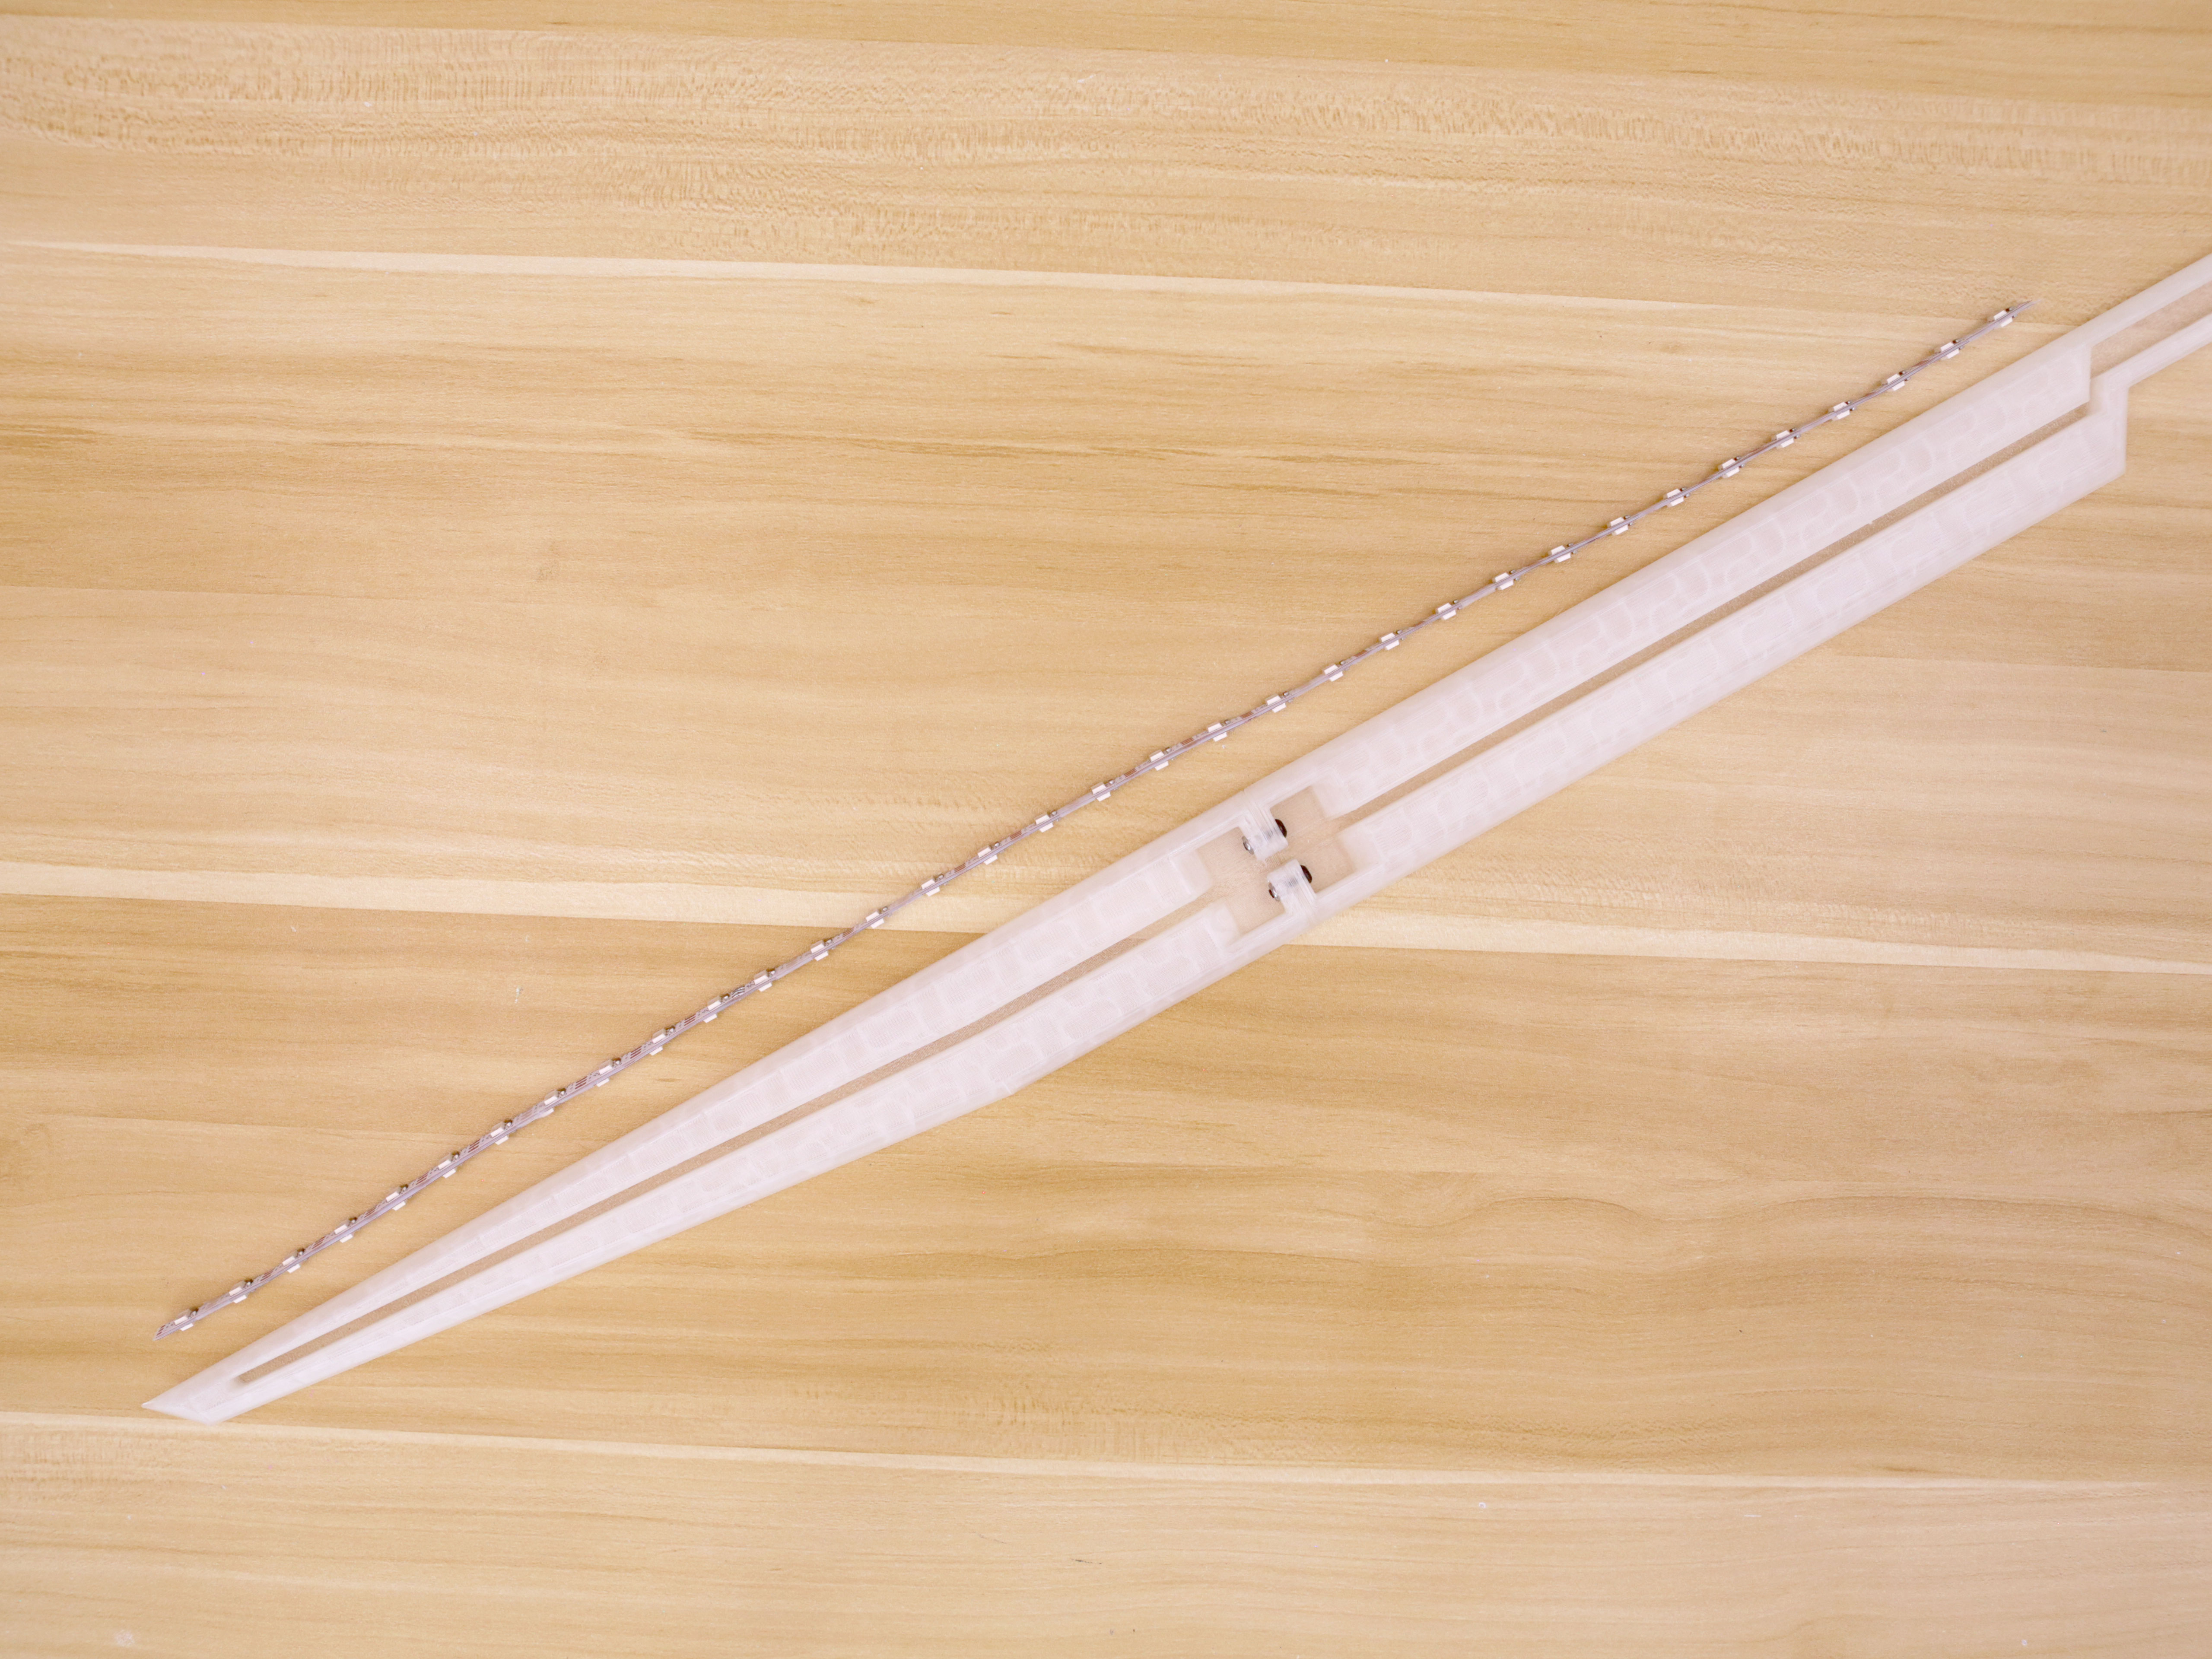 3d_printing_strip-double-wblade.jpg